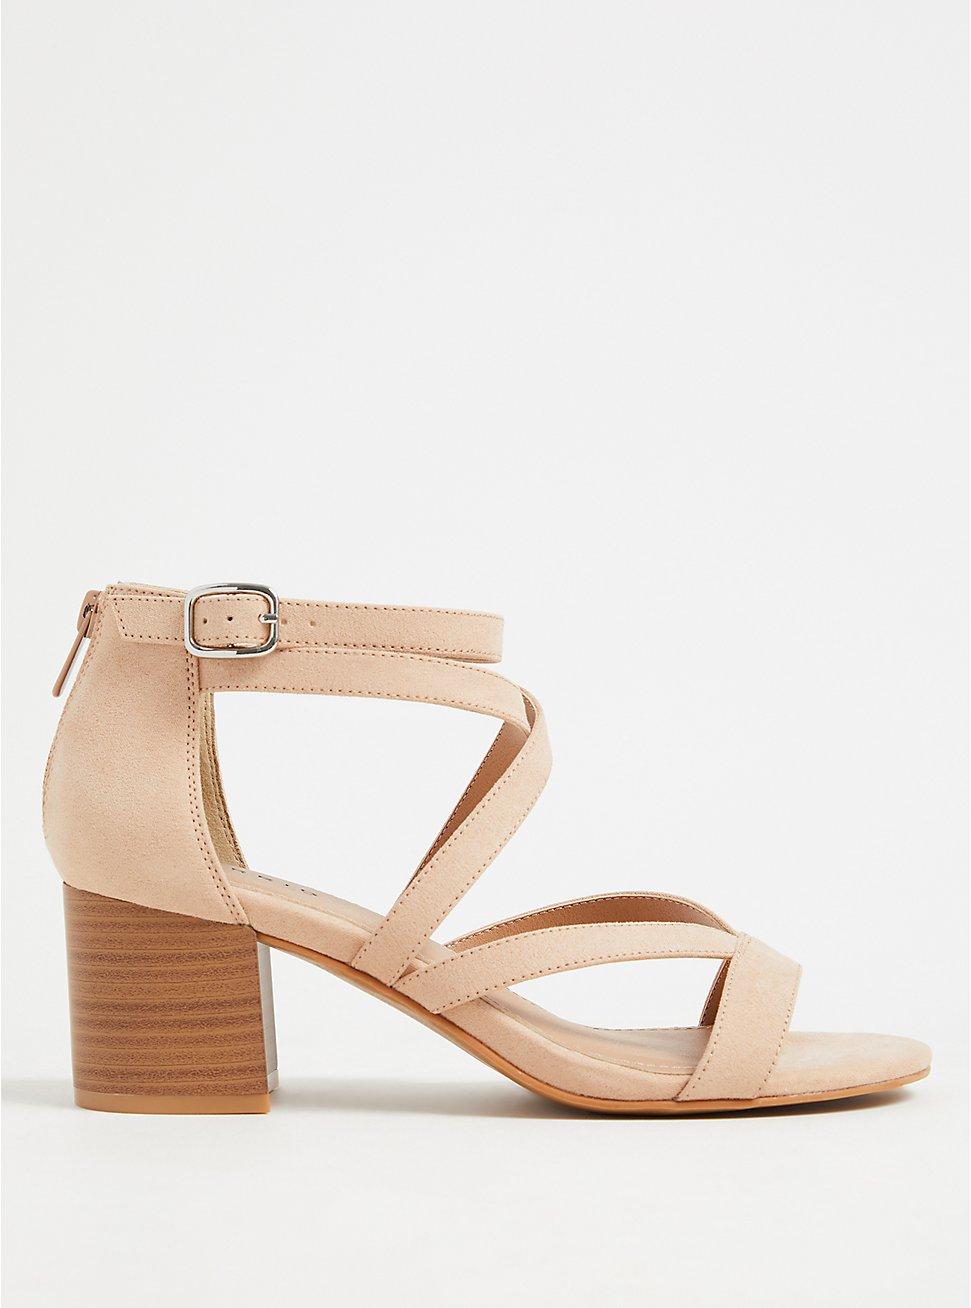 Plus Size Beige Faux Suede Strappy Block Heel Sandal (WW), , hi-res